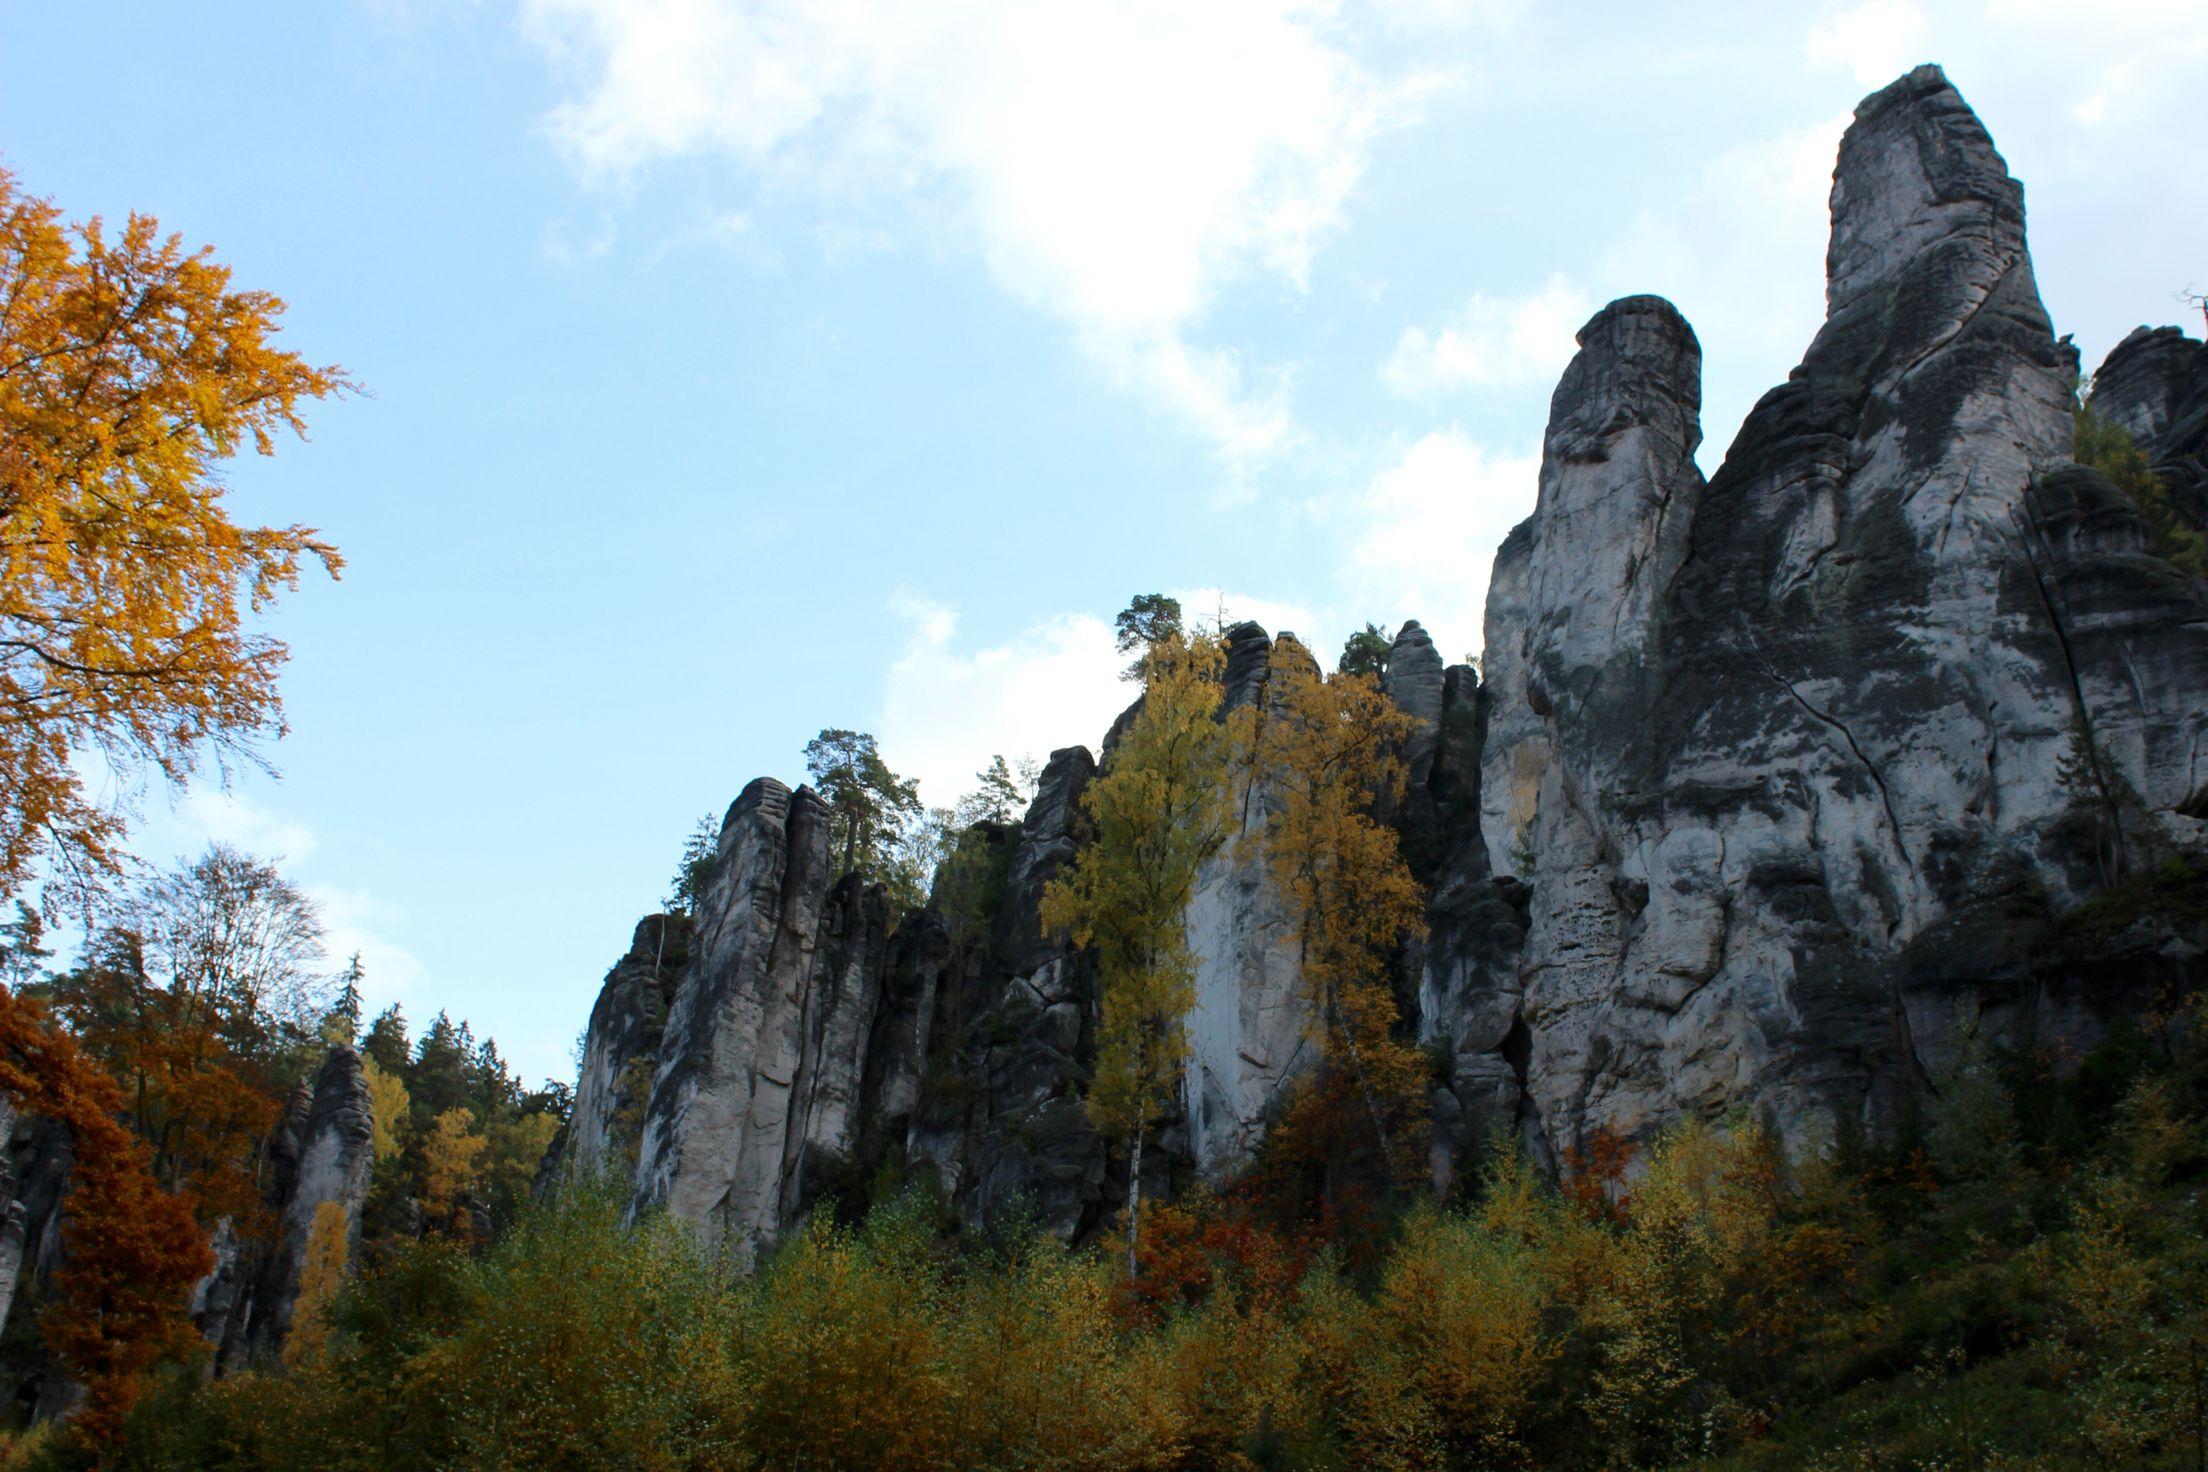 Prachovske Skaly 506 01 Zamosti Blata Czech Republic Prachovske Rocks Follow Also Www Facebook Com Voteltravels Natural Landmarks Landmarks Czech Republic